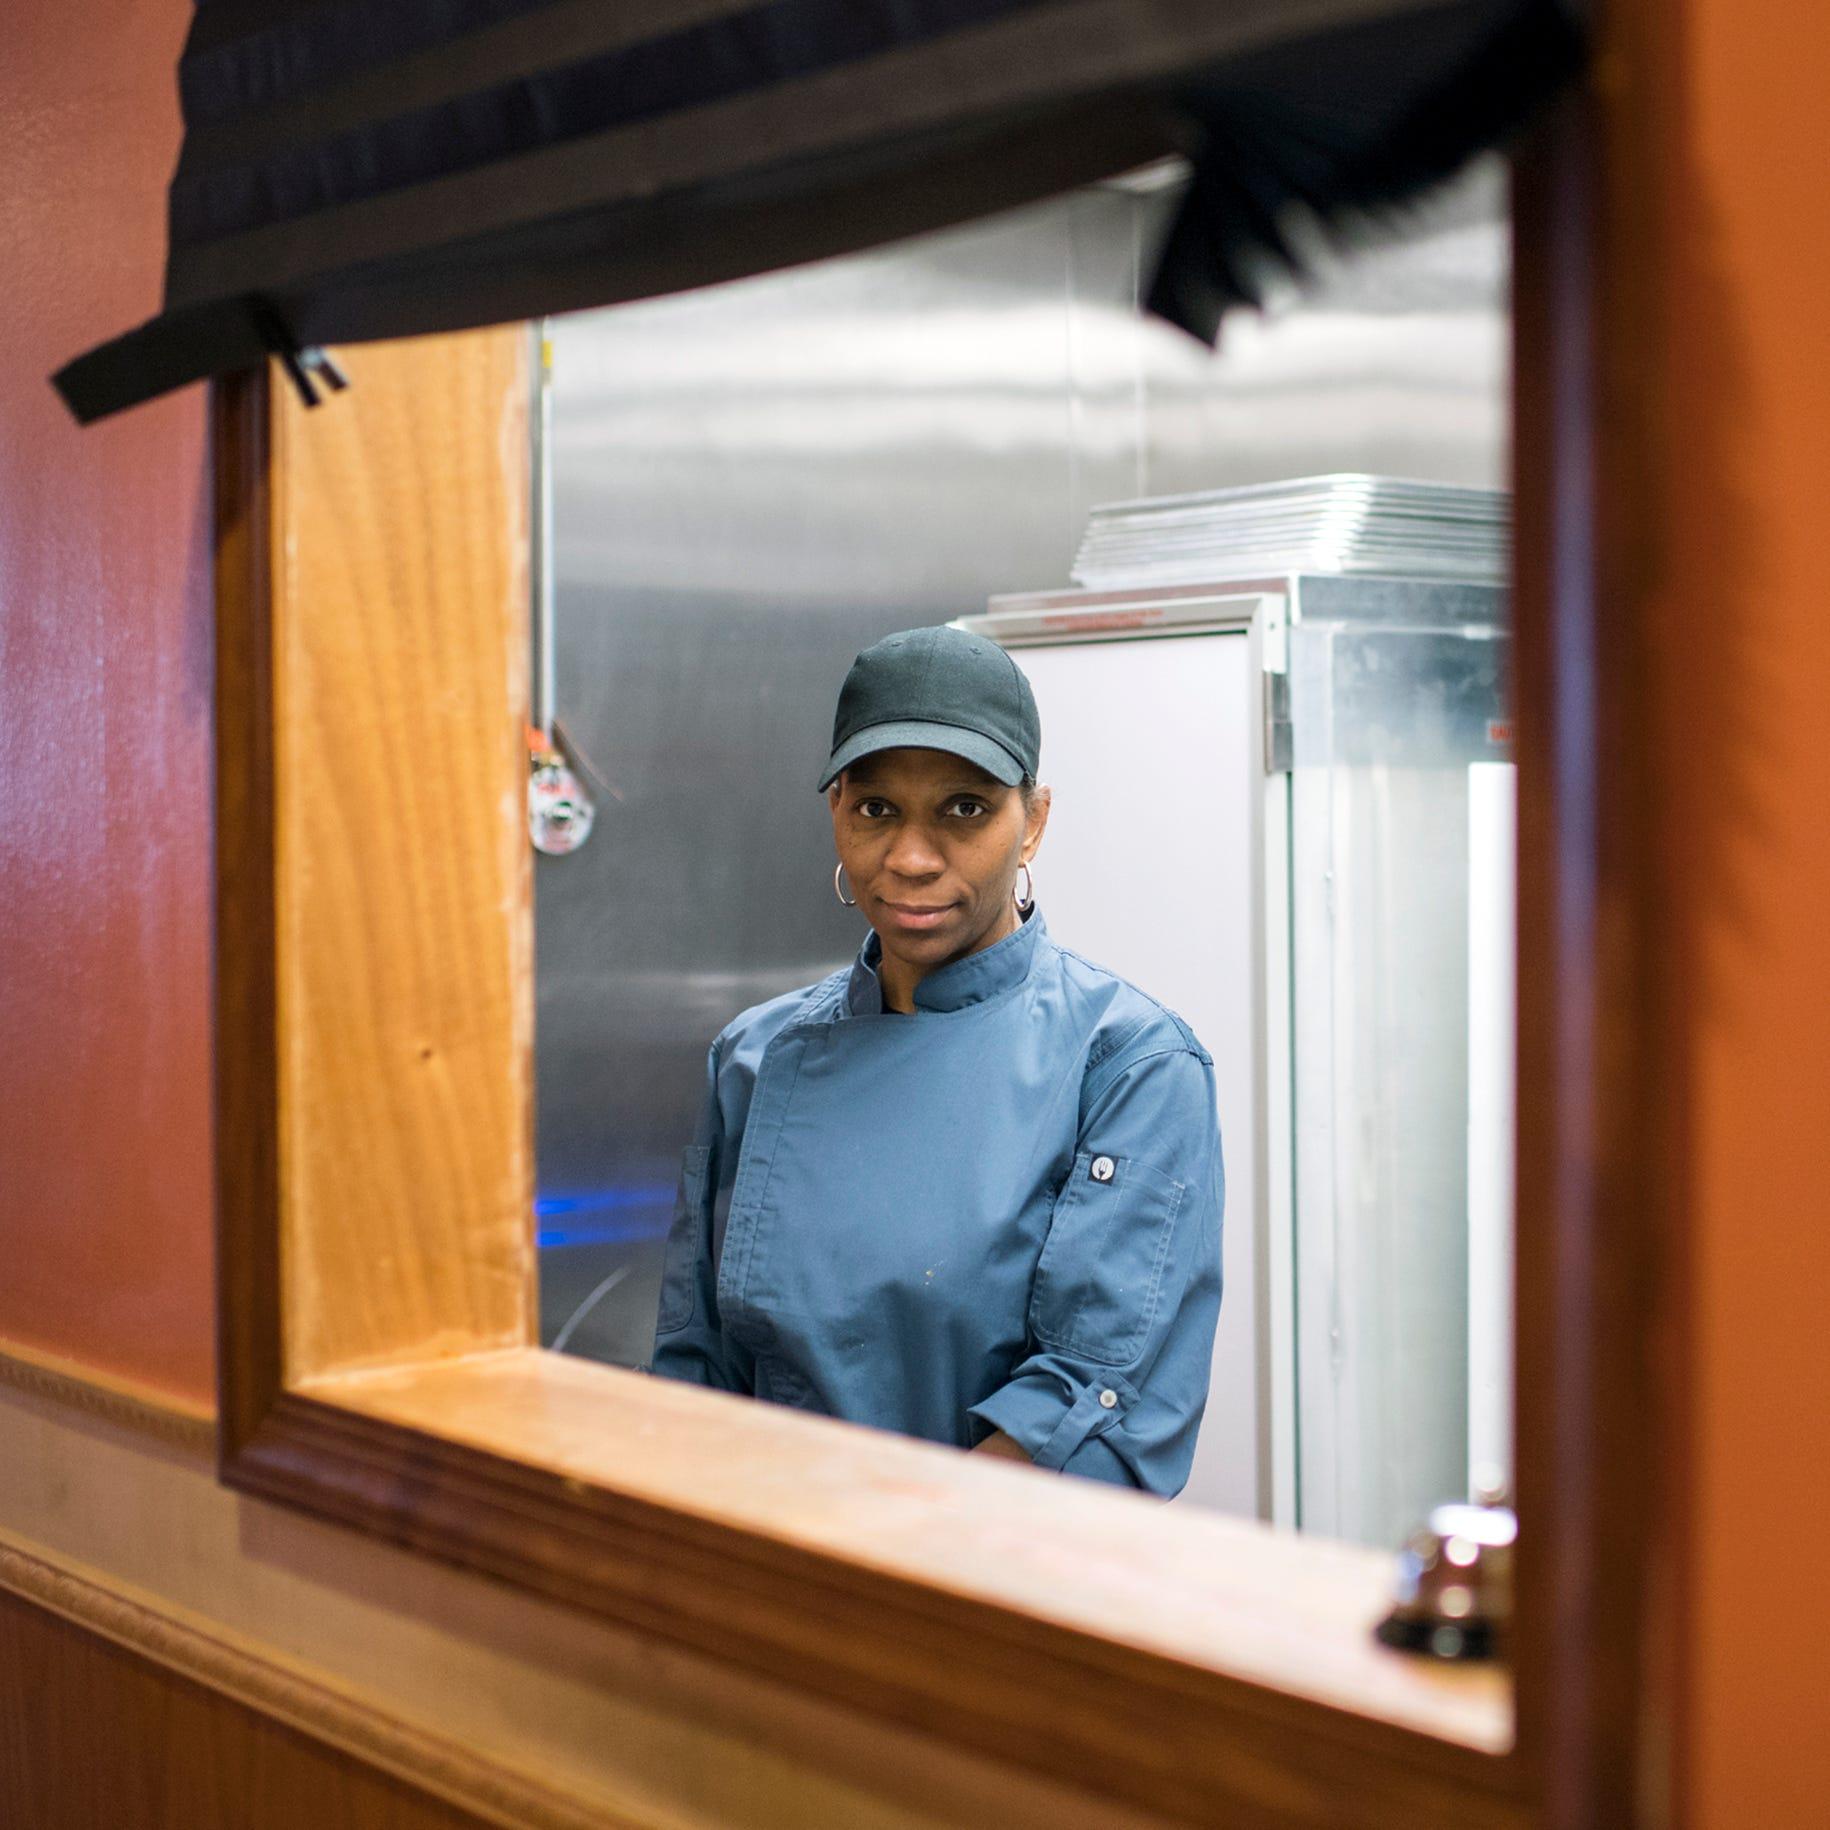 Chicken & sweet potato waffles? Taste of SOUL brings new flavor, sounds to Burlington City